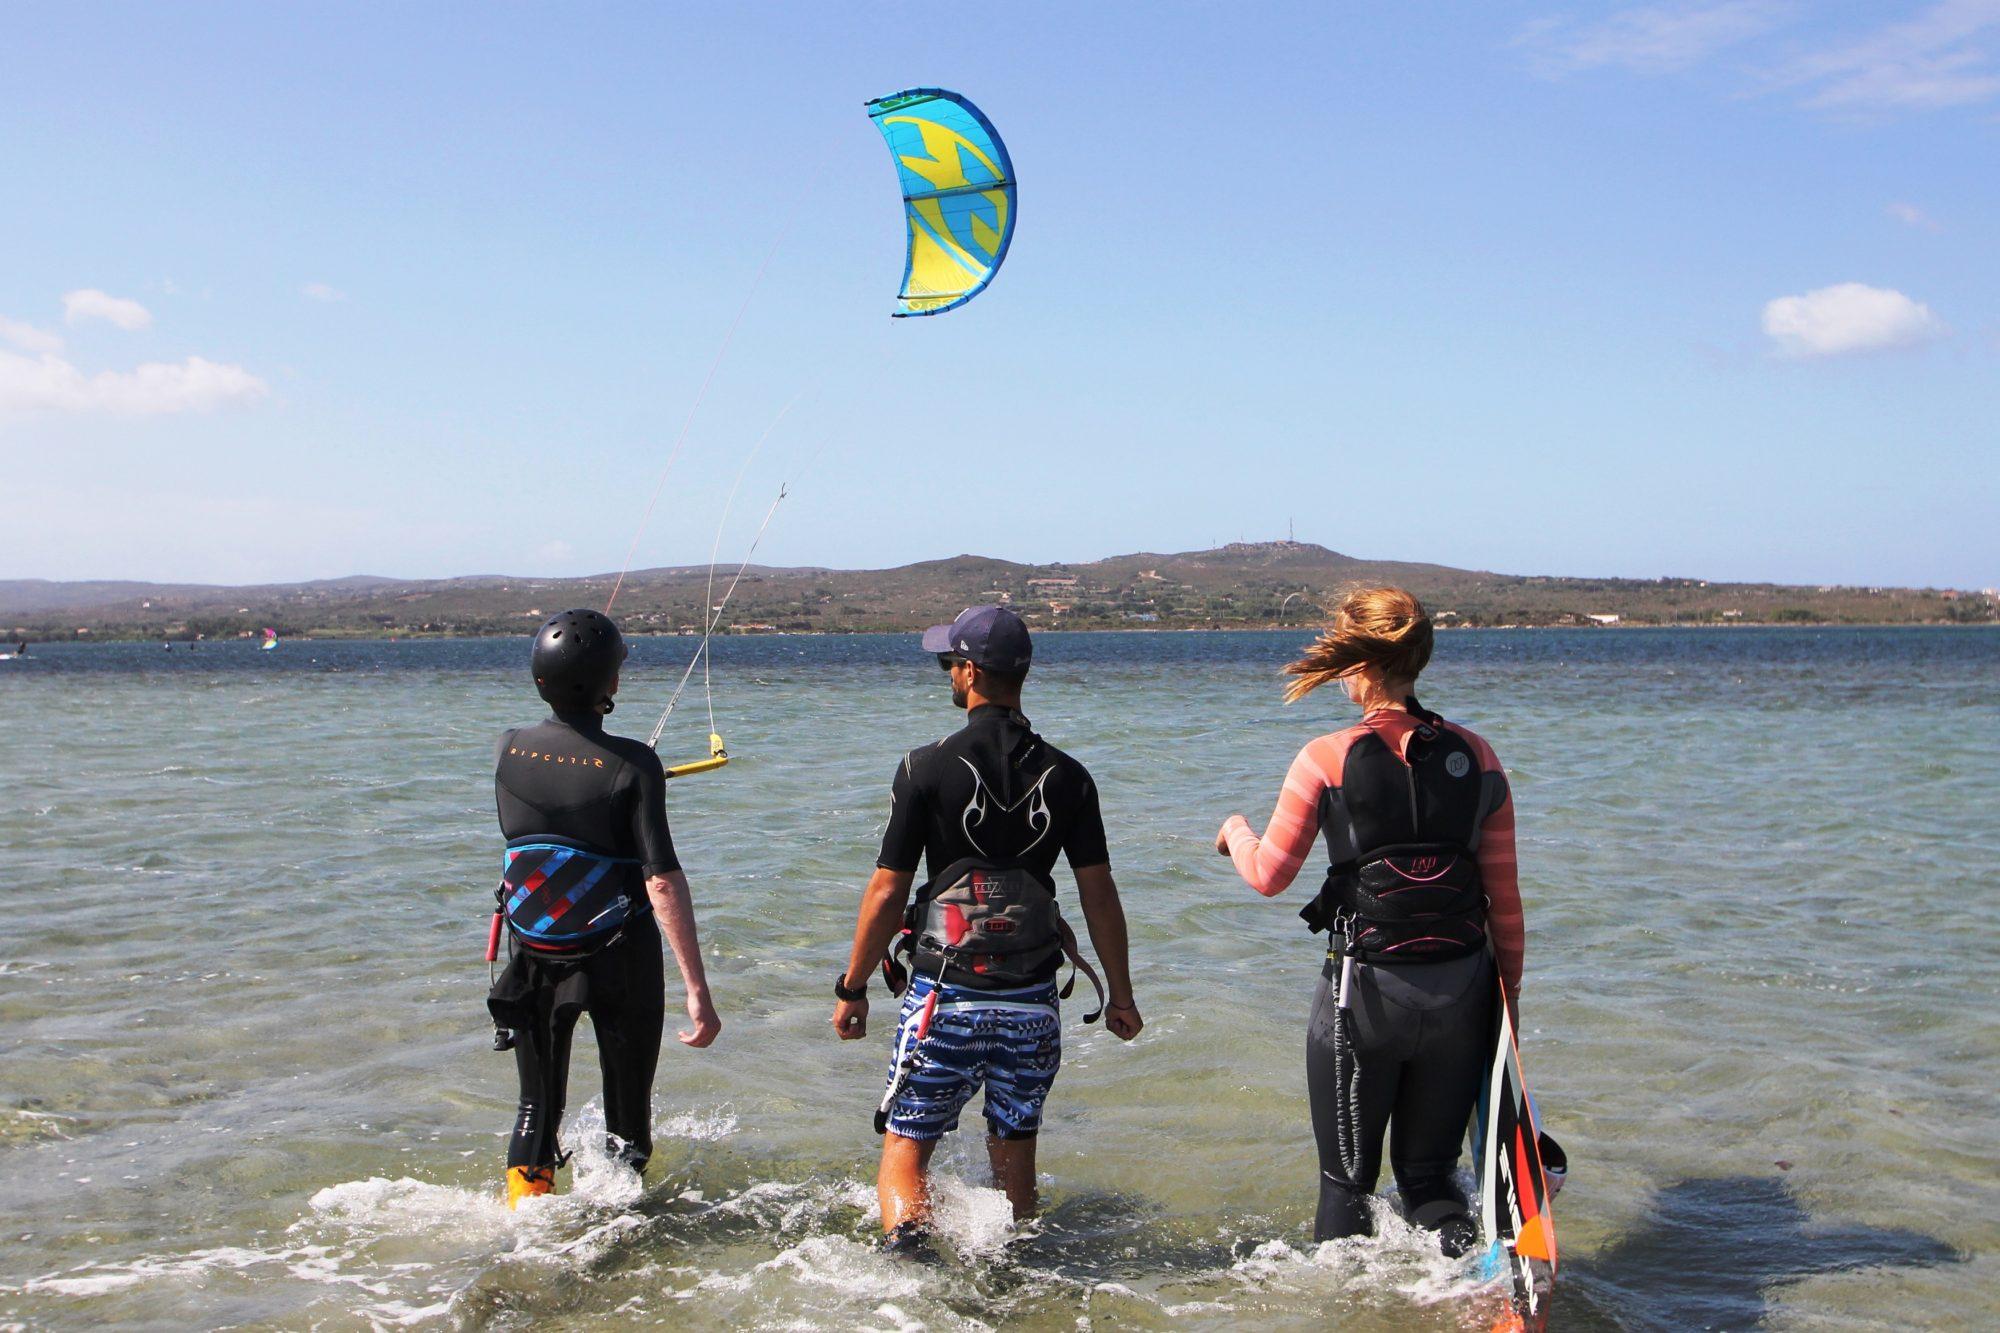 Kitekurs Sardinien Kiten Lernen in Punta Trettu Sardinien